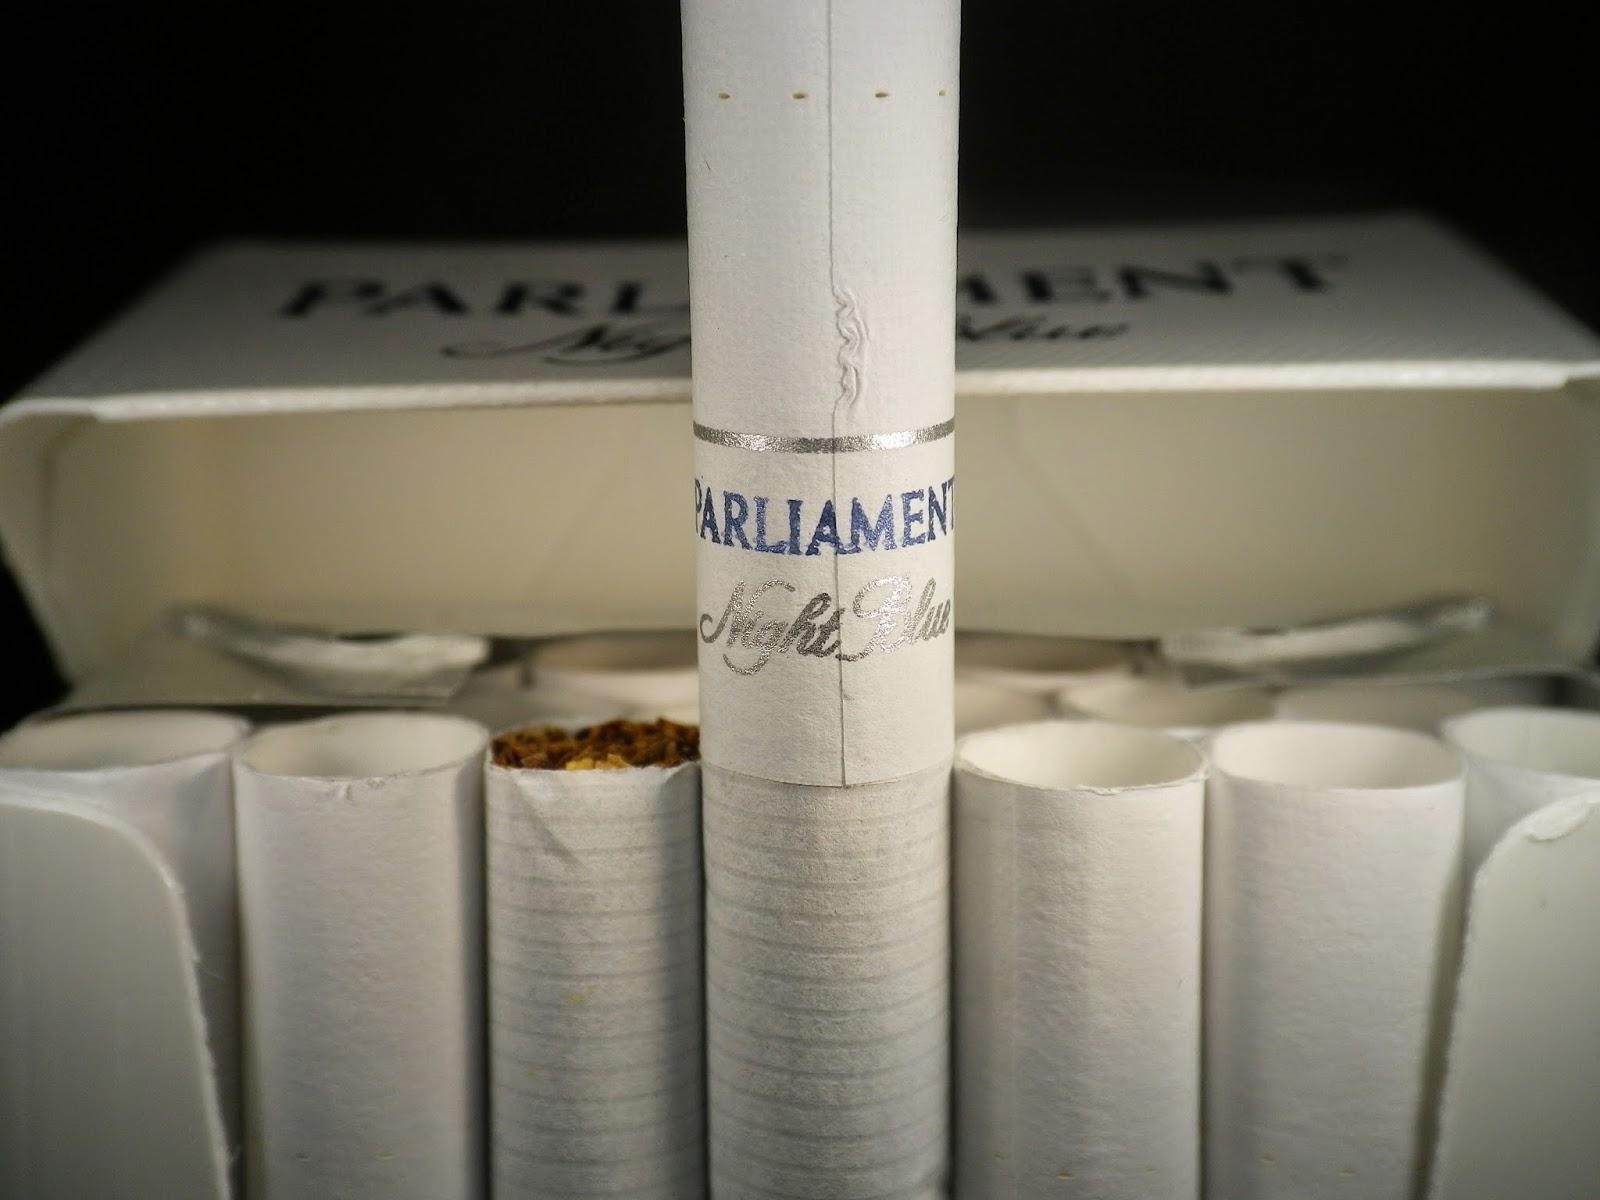 Parliament lights cigarettes coupons - Joann fabrics coupons